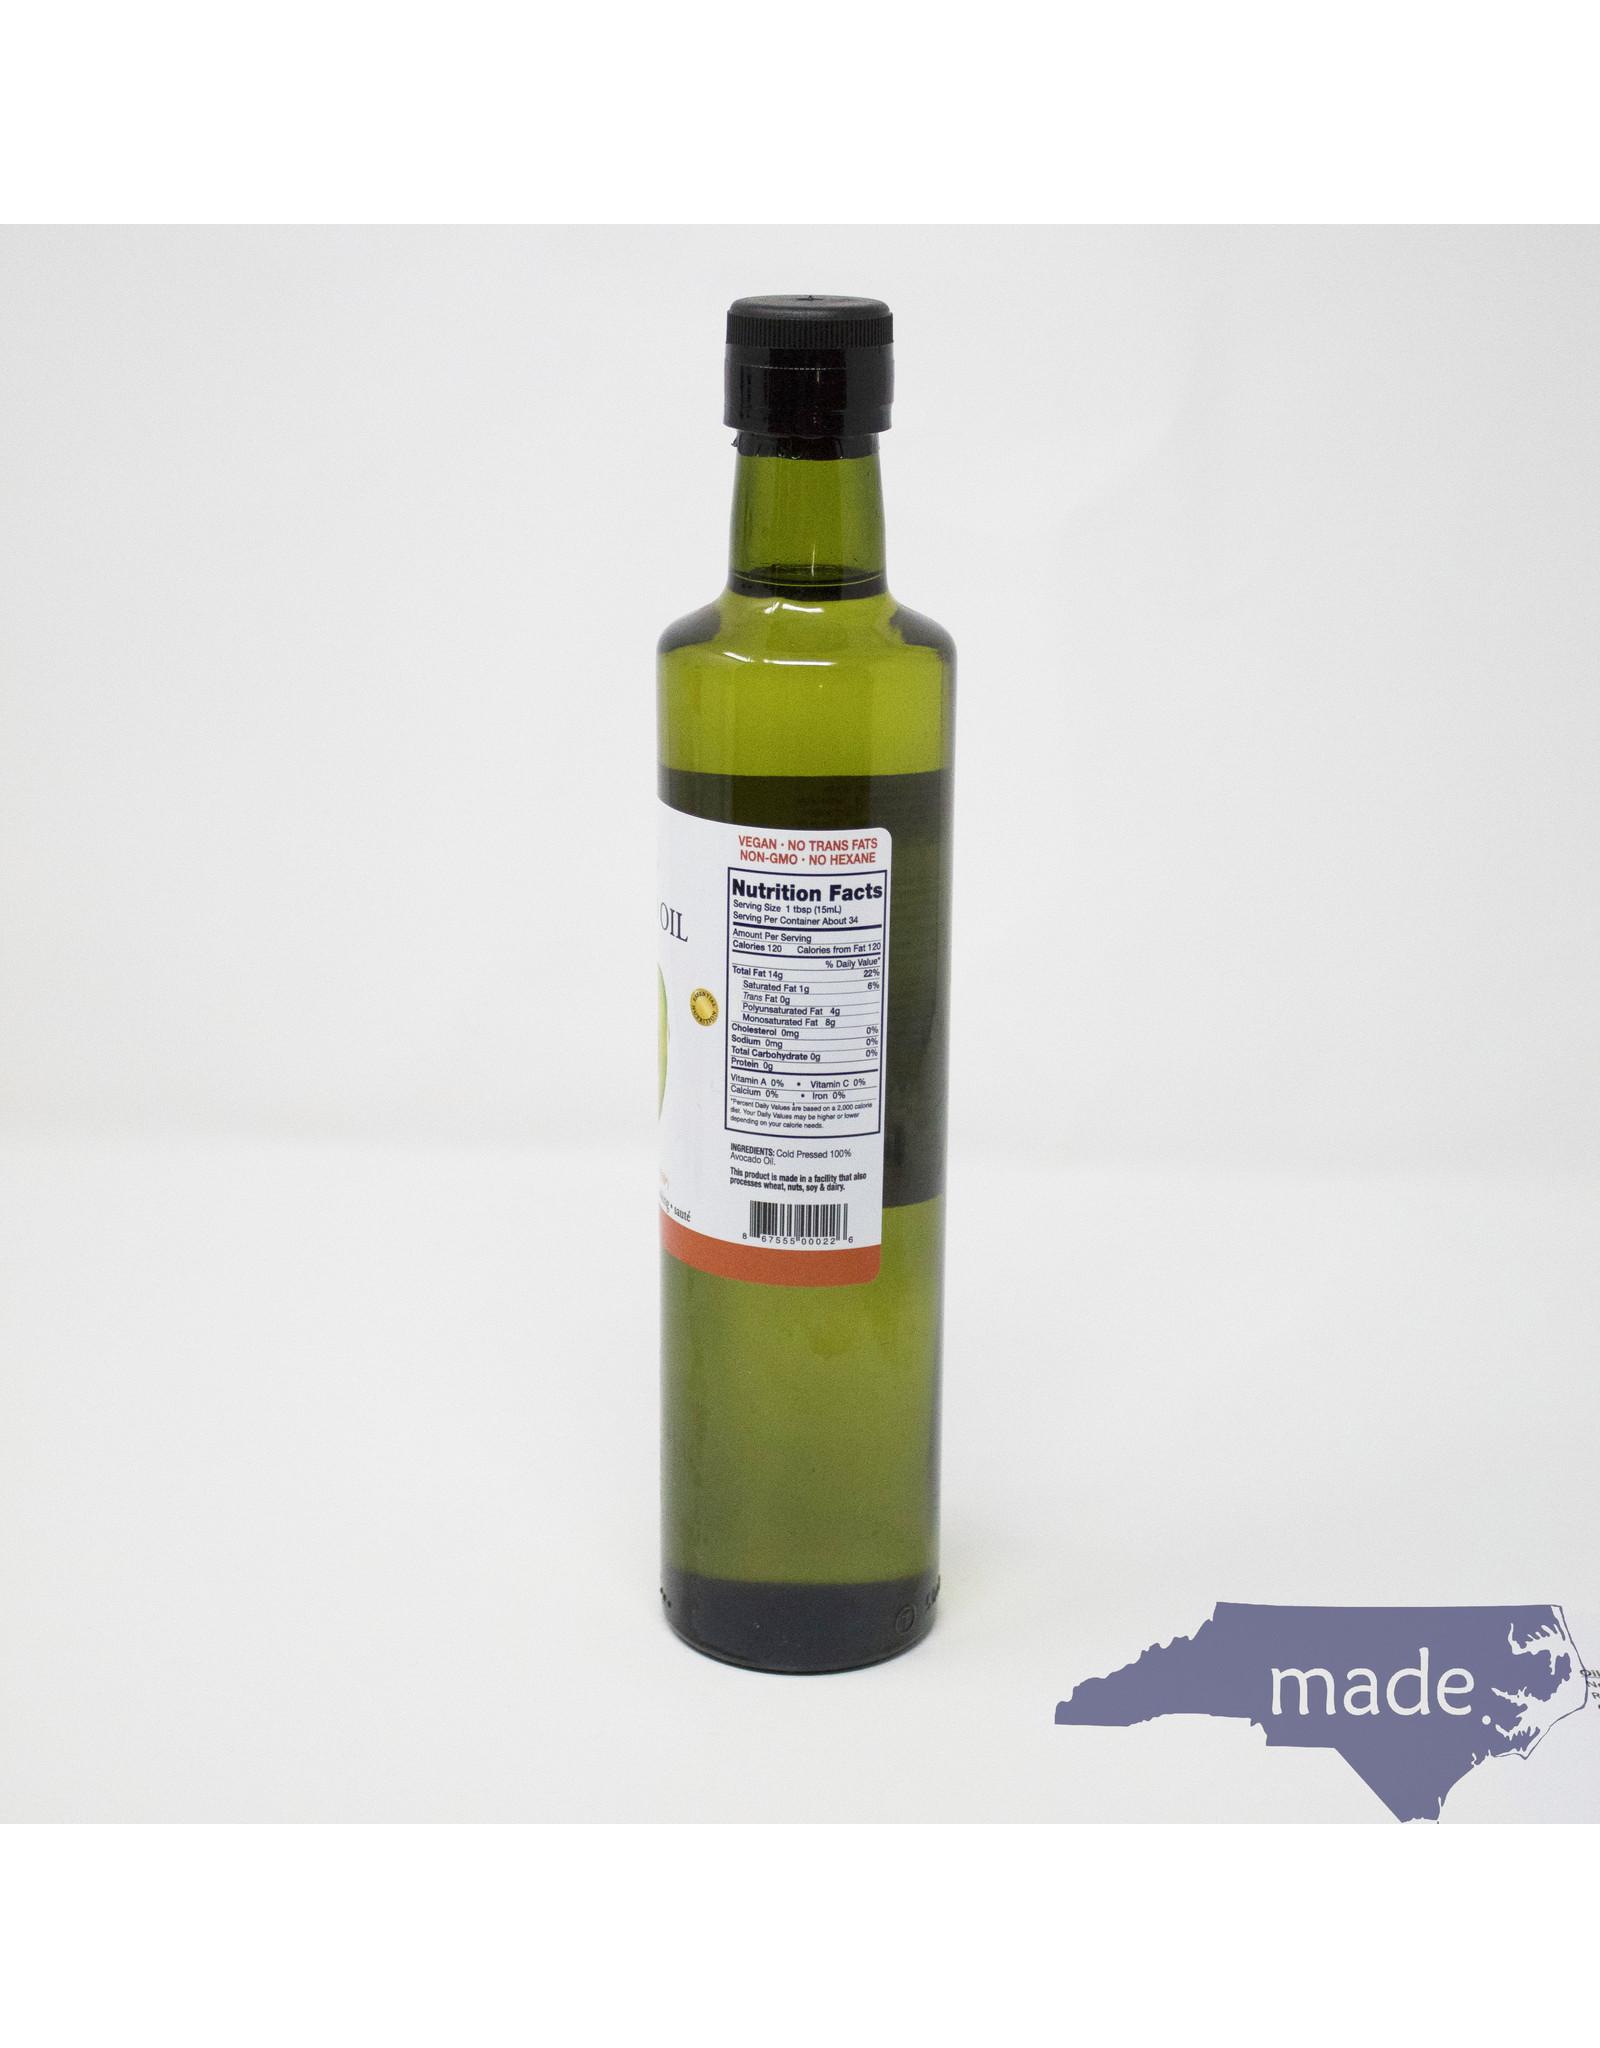 Neomega Avocado Oil 17 oz. - Neomega